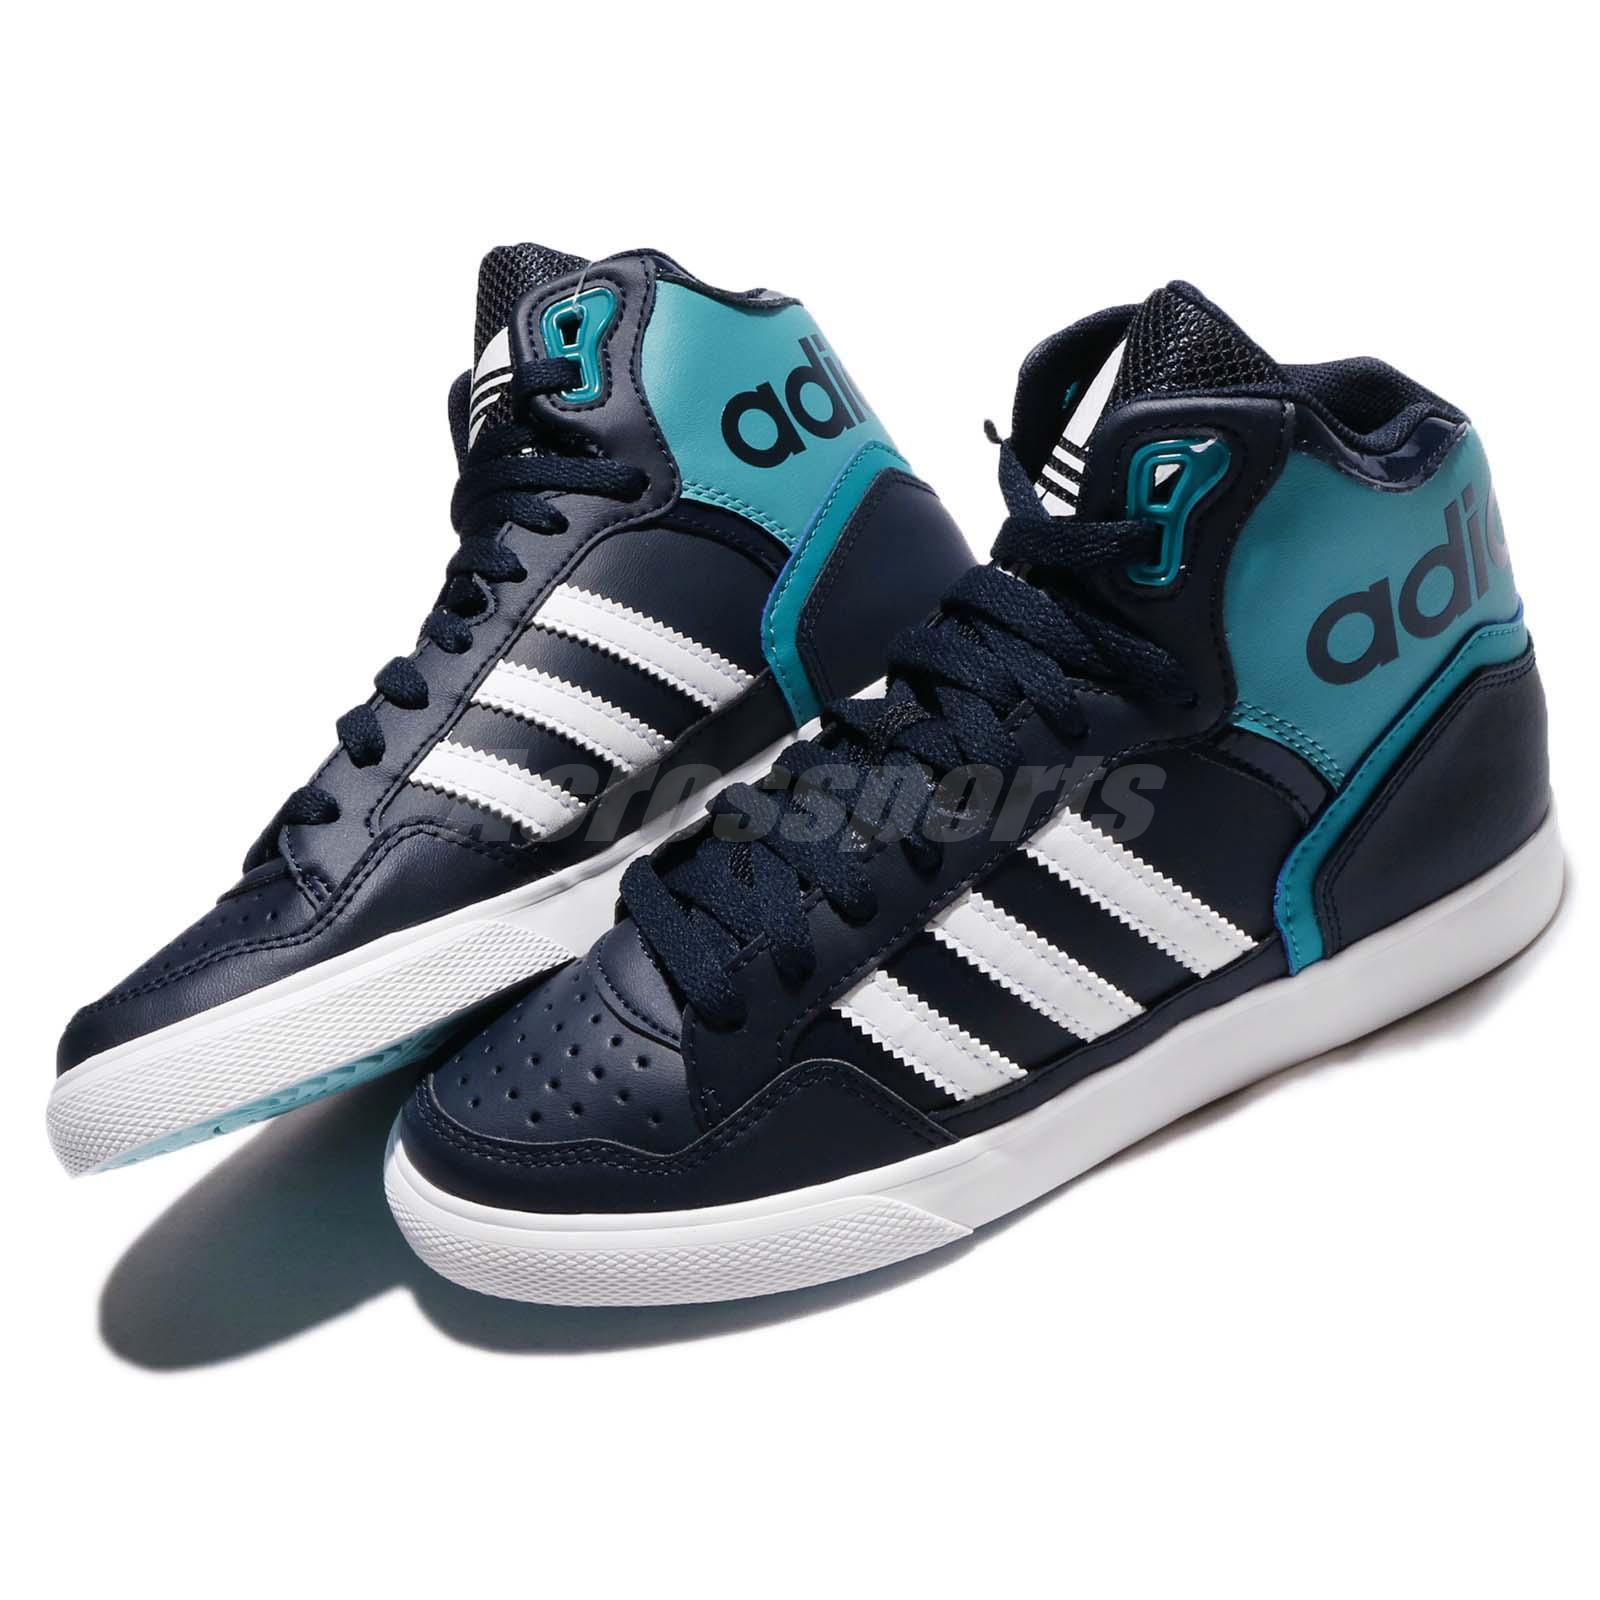 sale retailer 8f9b4 1abcb Adidas ORIGINALS EXTABALL W Hi Azul Blanco Retro Mujeres Zapatos ...